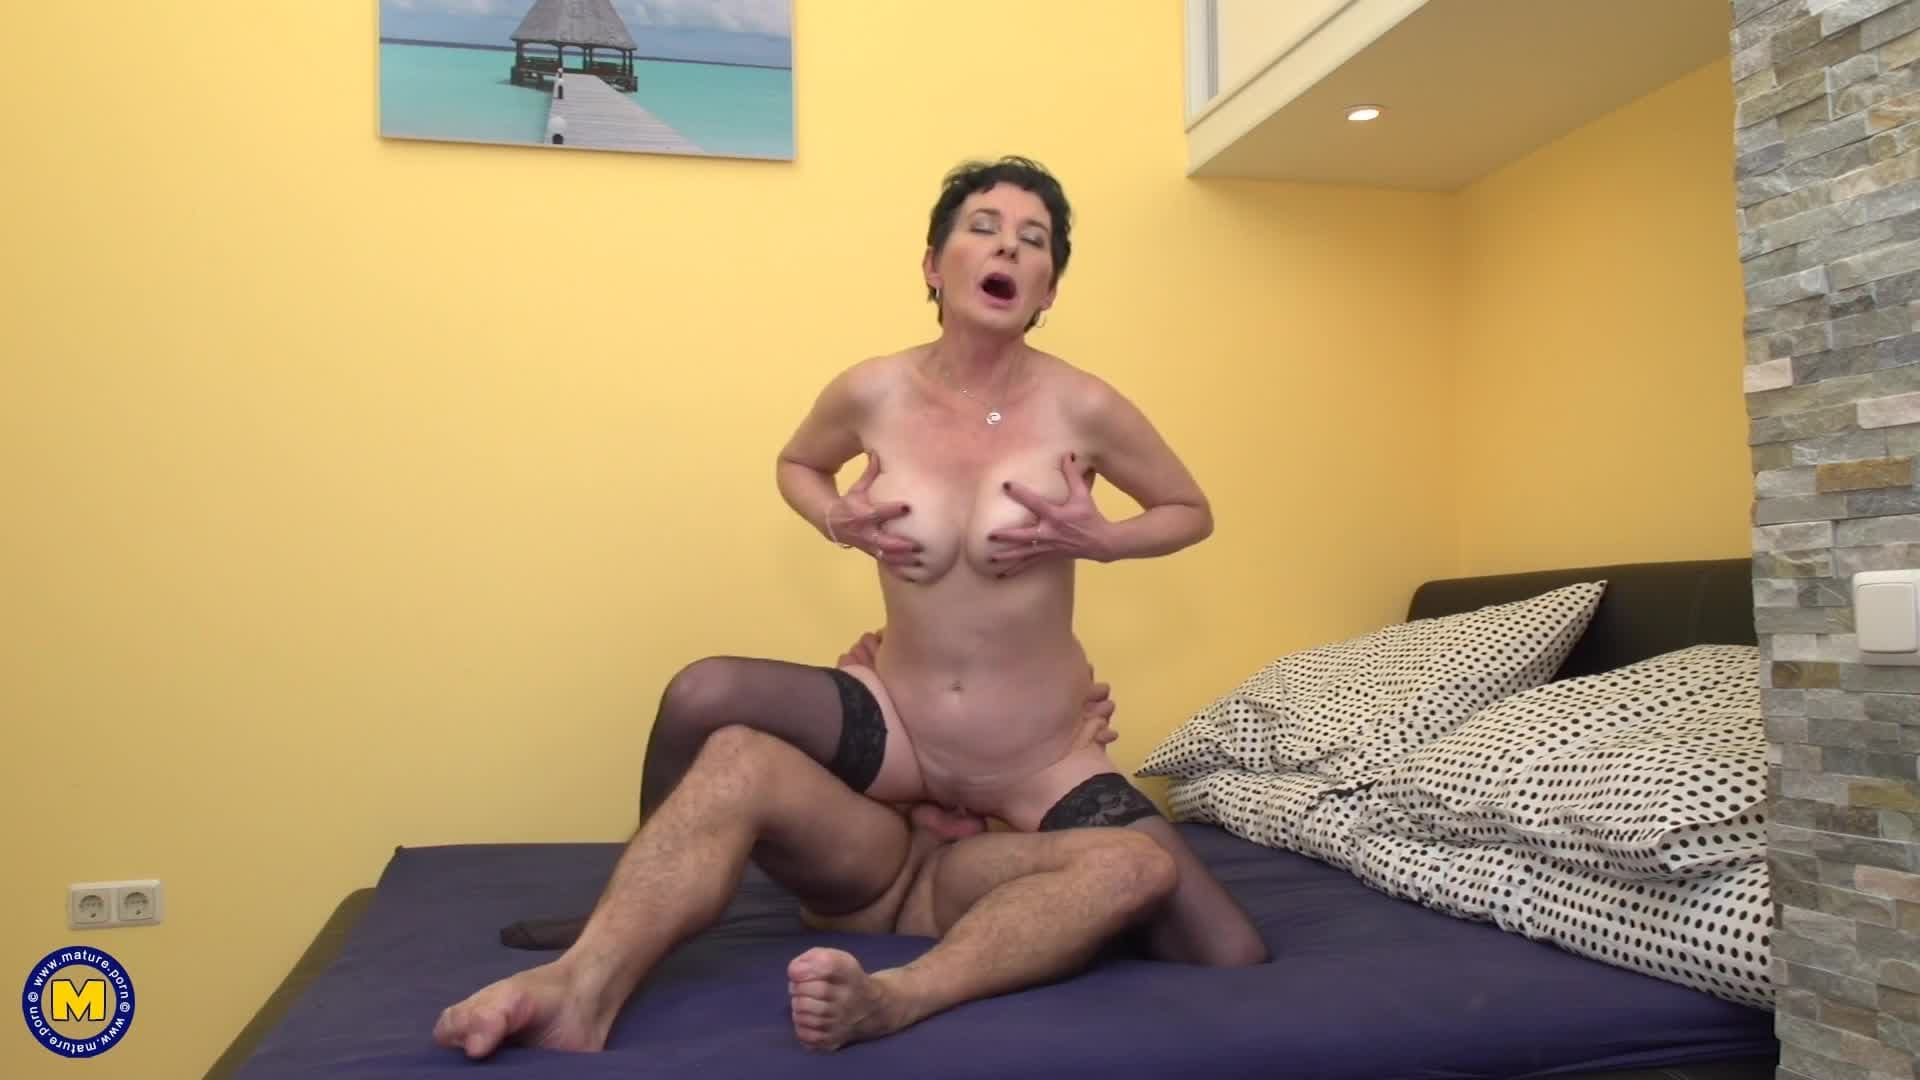 Real hotel maid watch wank